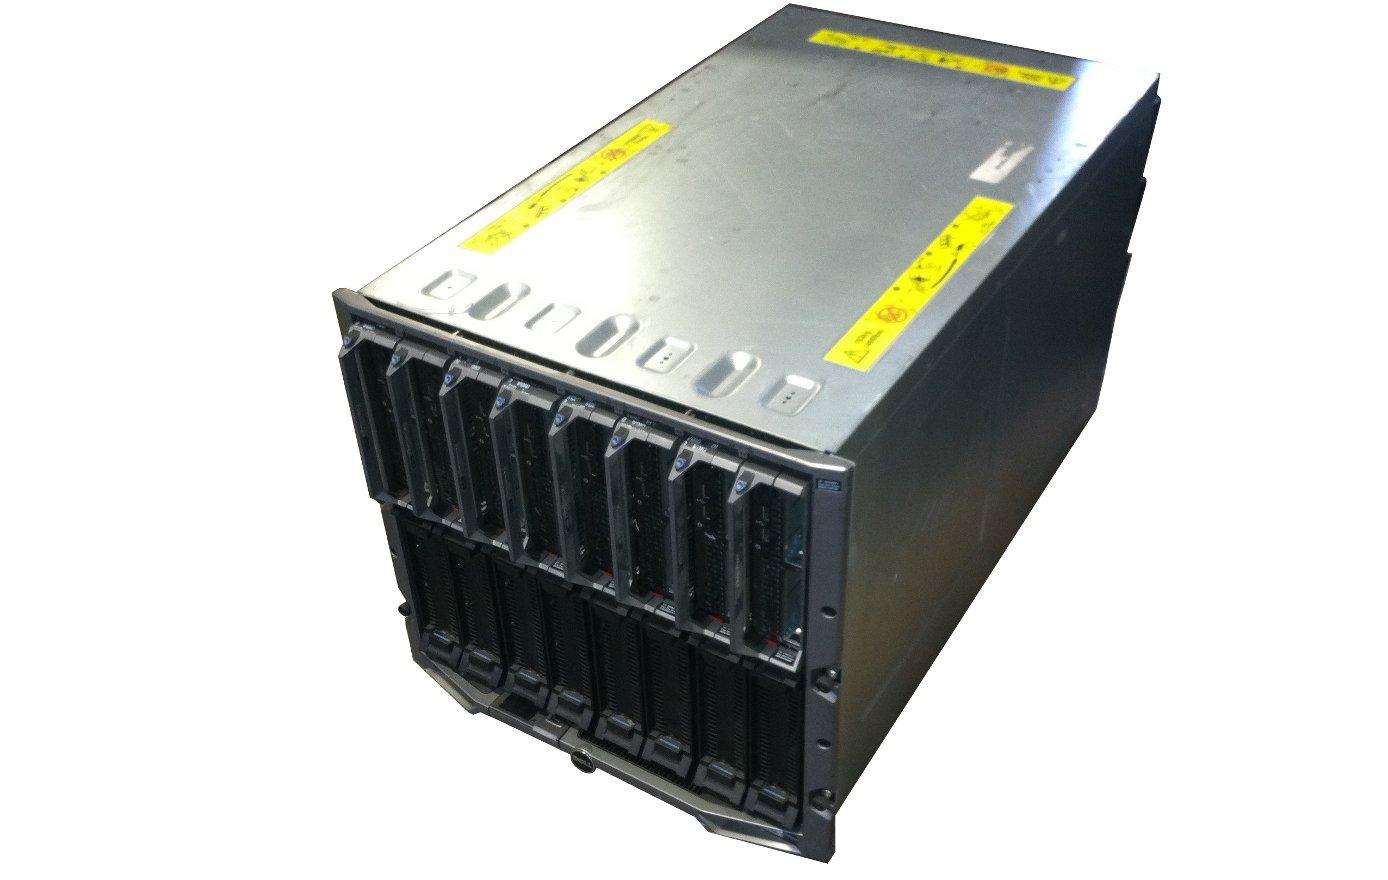 Buy Dell M1000e Blade Server Enclosure 8x M610 Blade Servers 2x 2 40